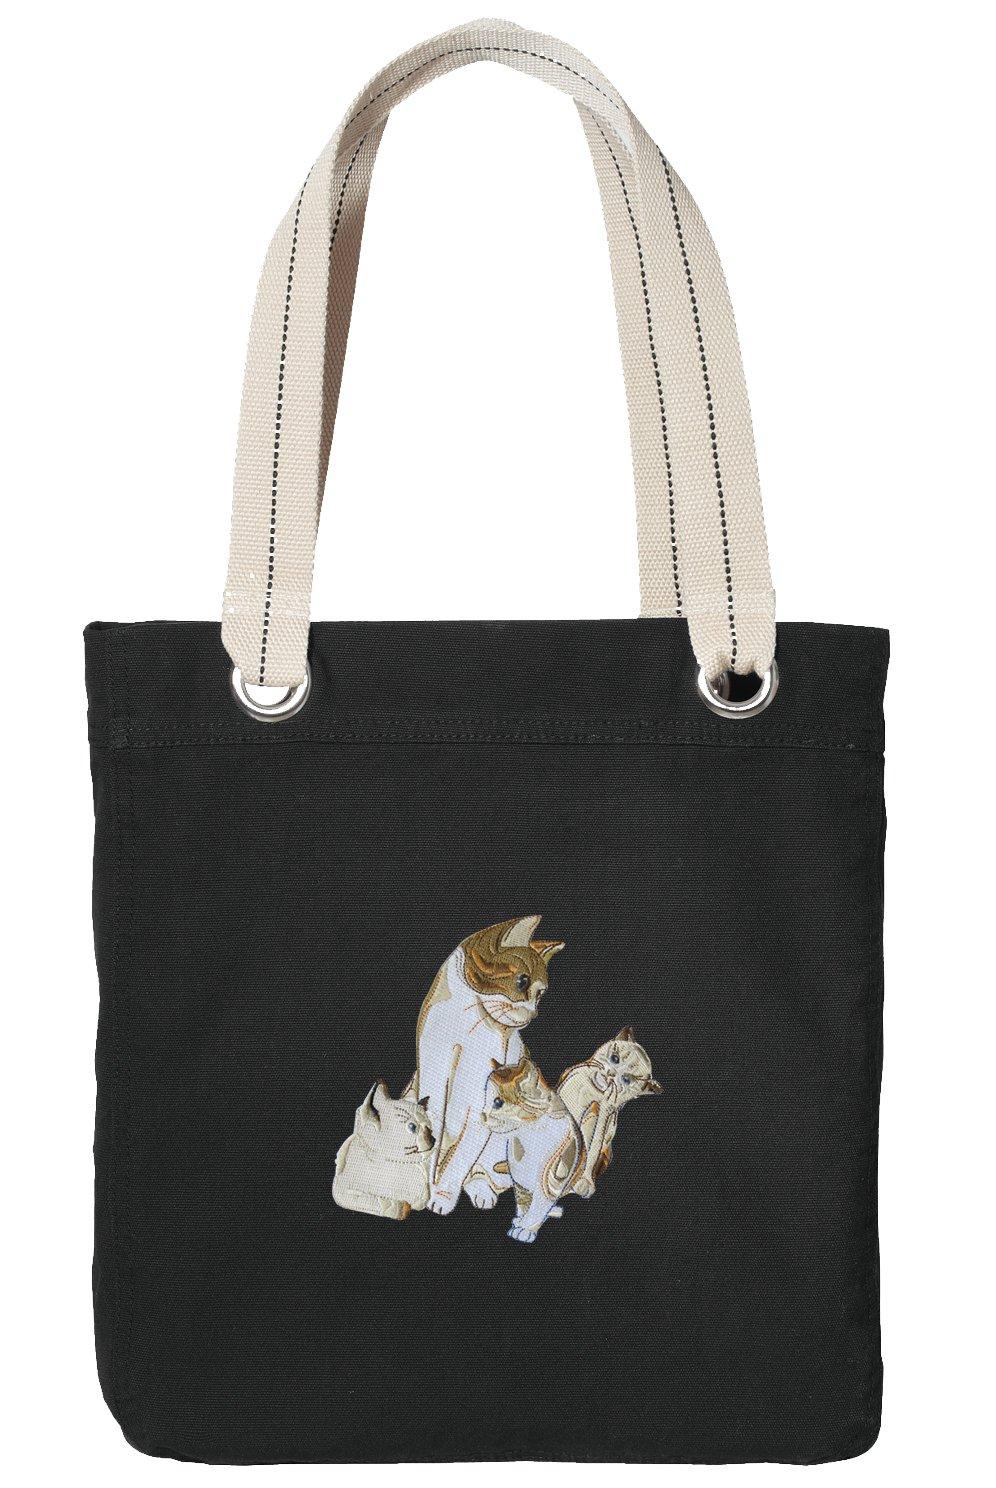 Cute Cat Tote Bag RICH COTTON CANVAS Kitten Bags Black